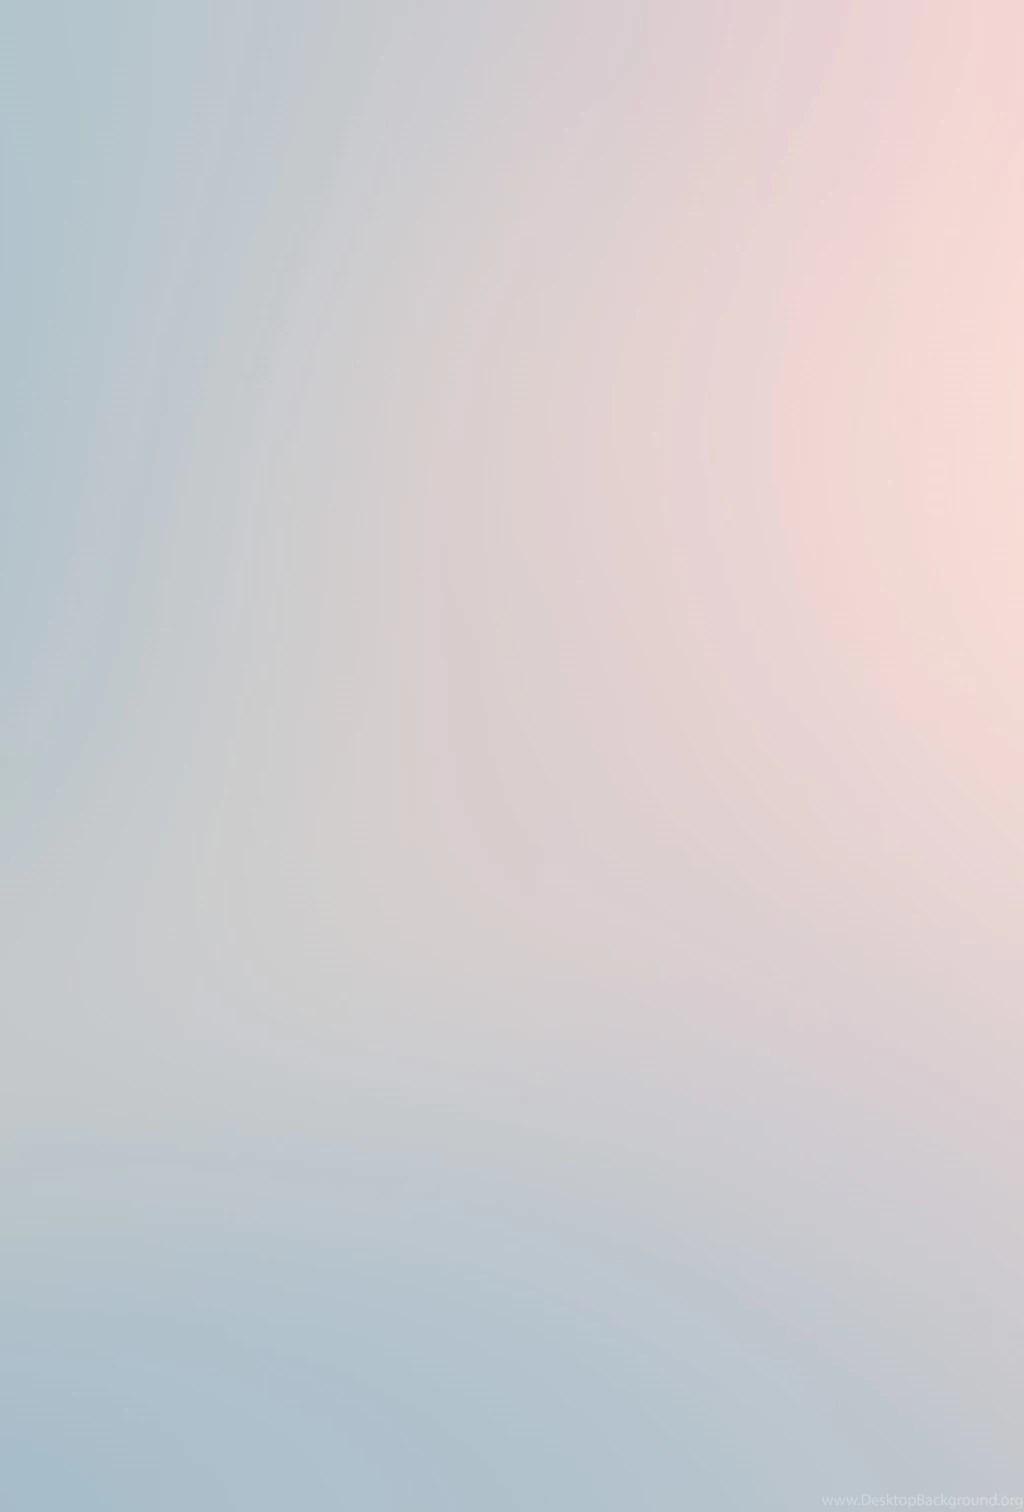 White Plain Hd Wallpaper Background